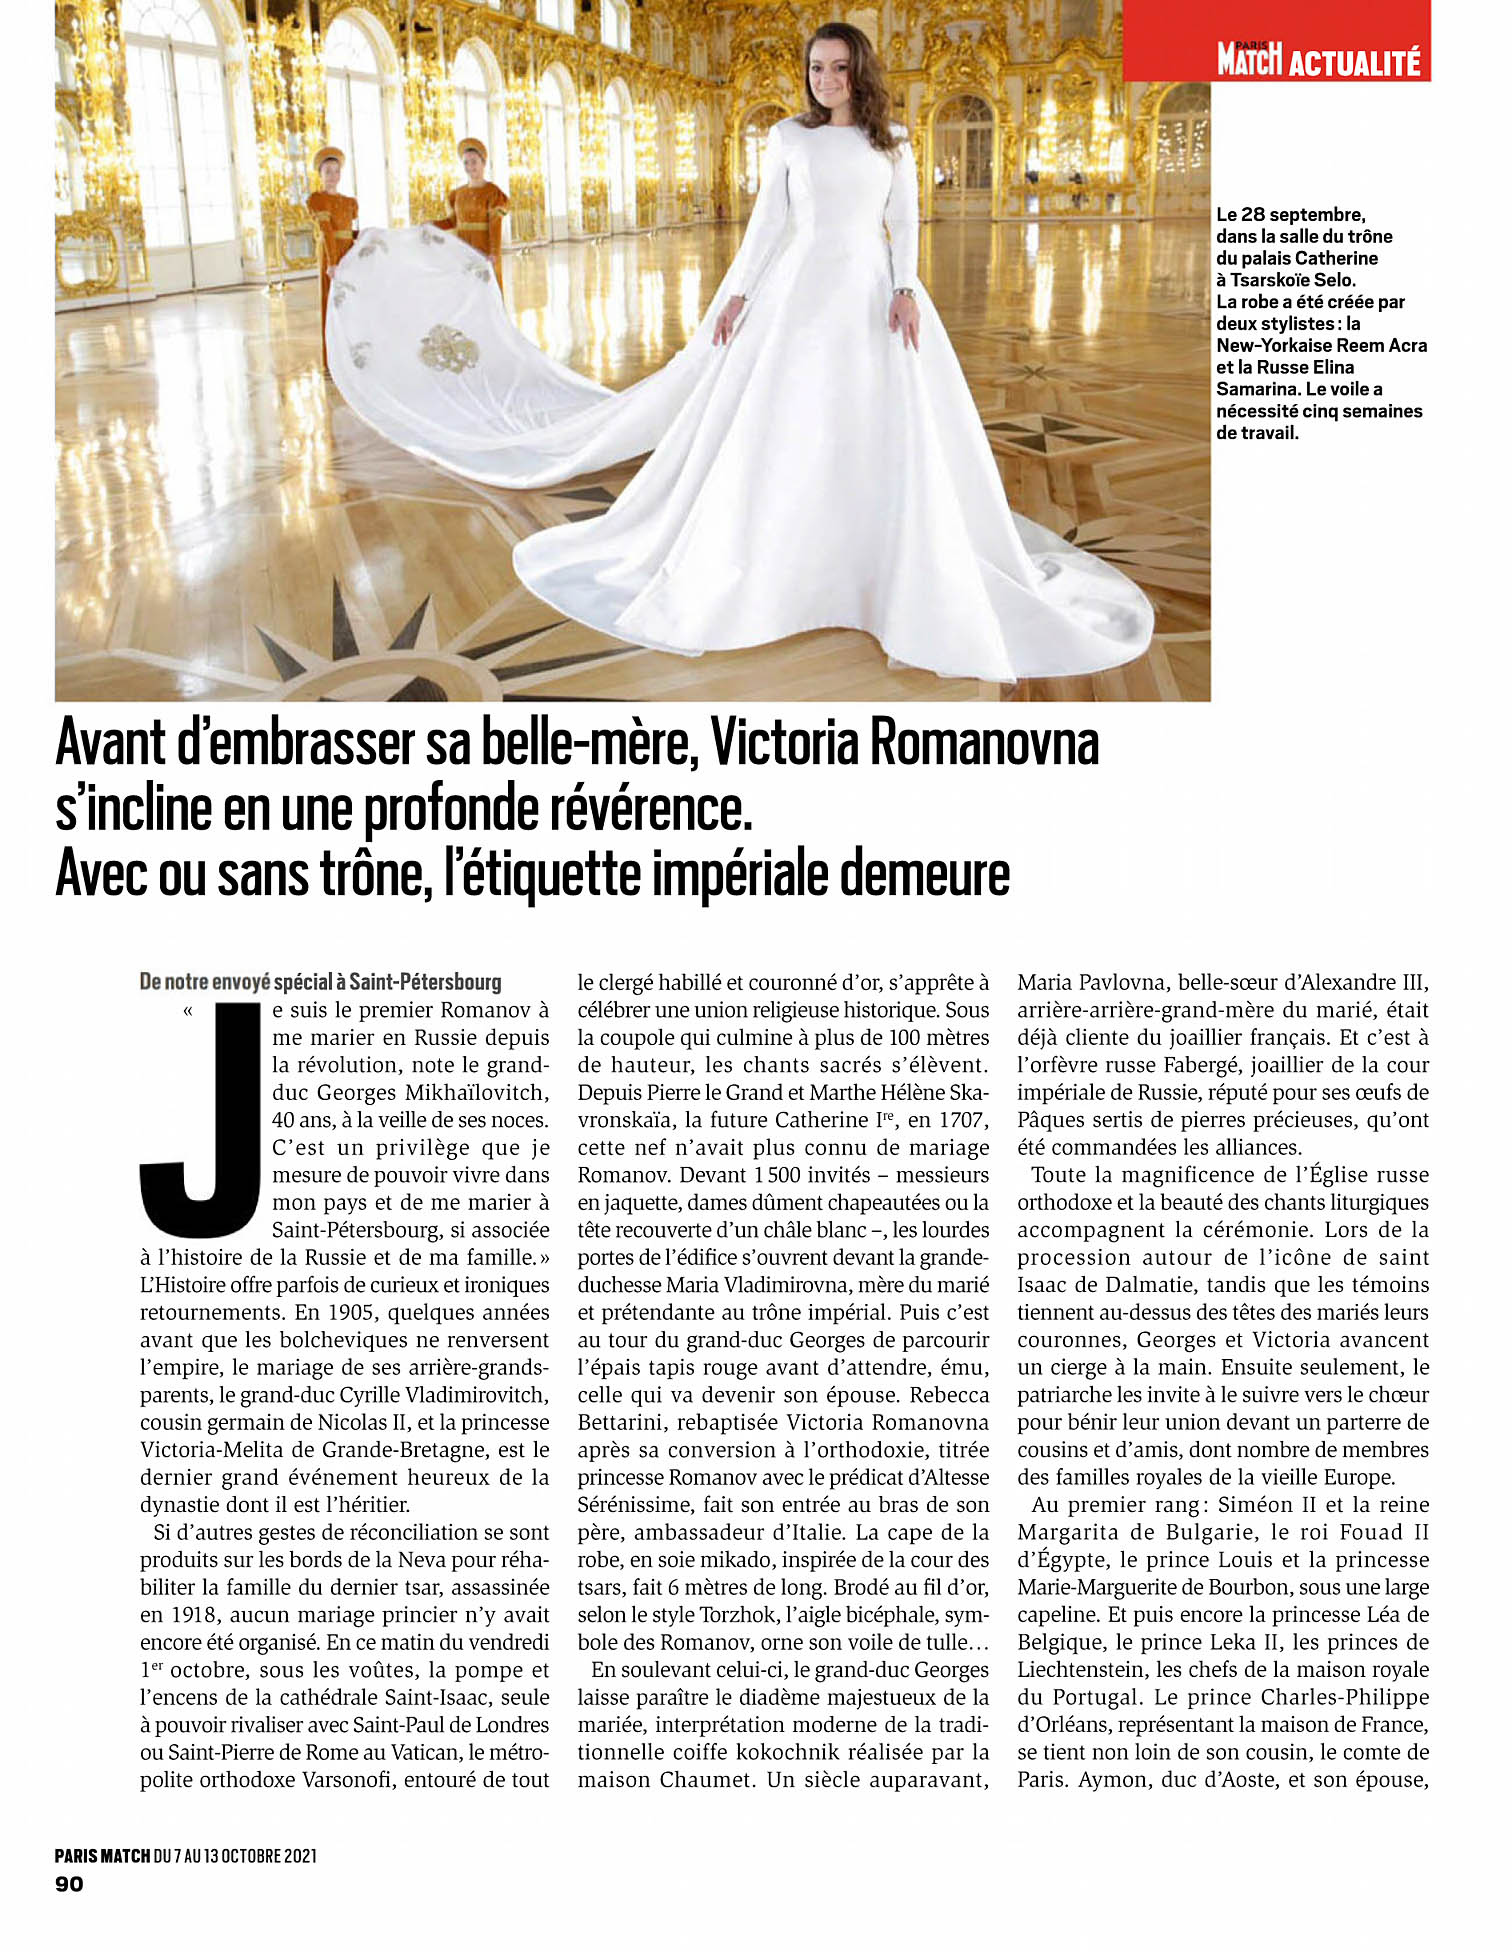 Paris Match 211007 Rus Royal 05.jpg